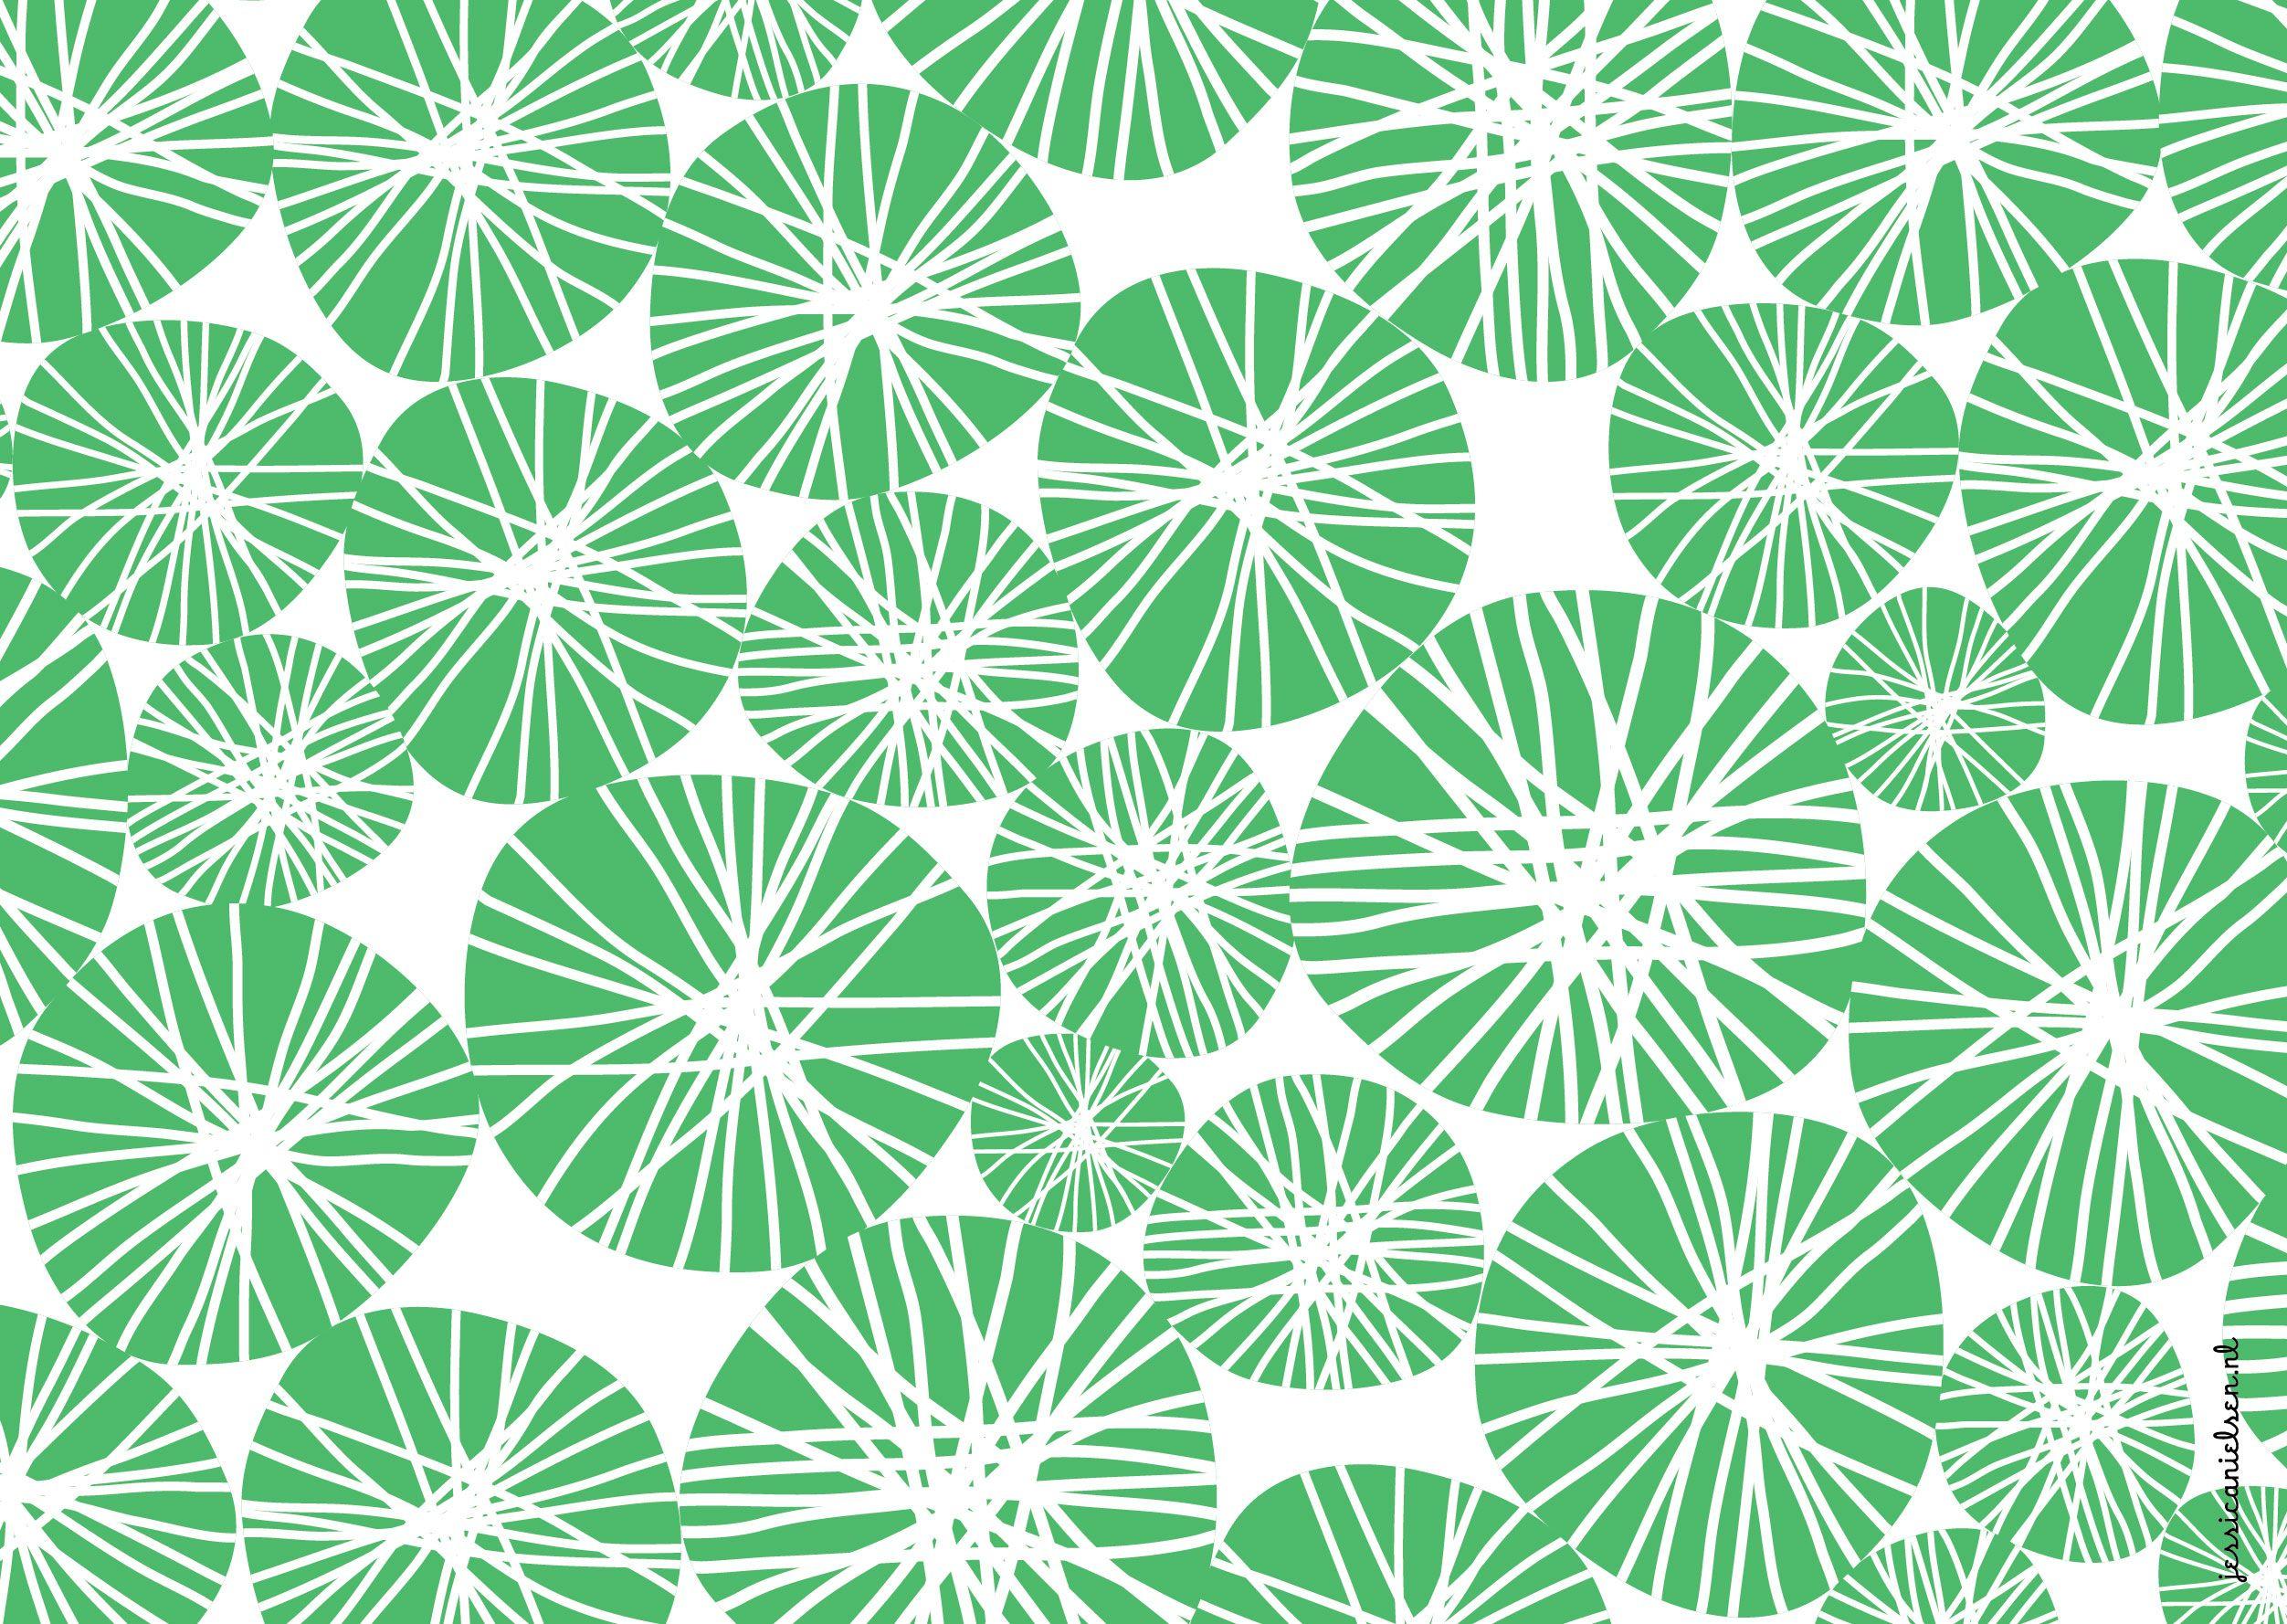 Printable Wrapping Paper La Deuxi Me Collection   Gift Things - Free Printable Wrapping Paper Patterns